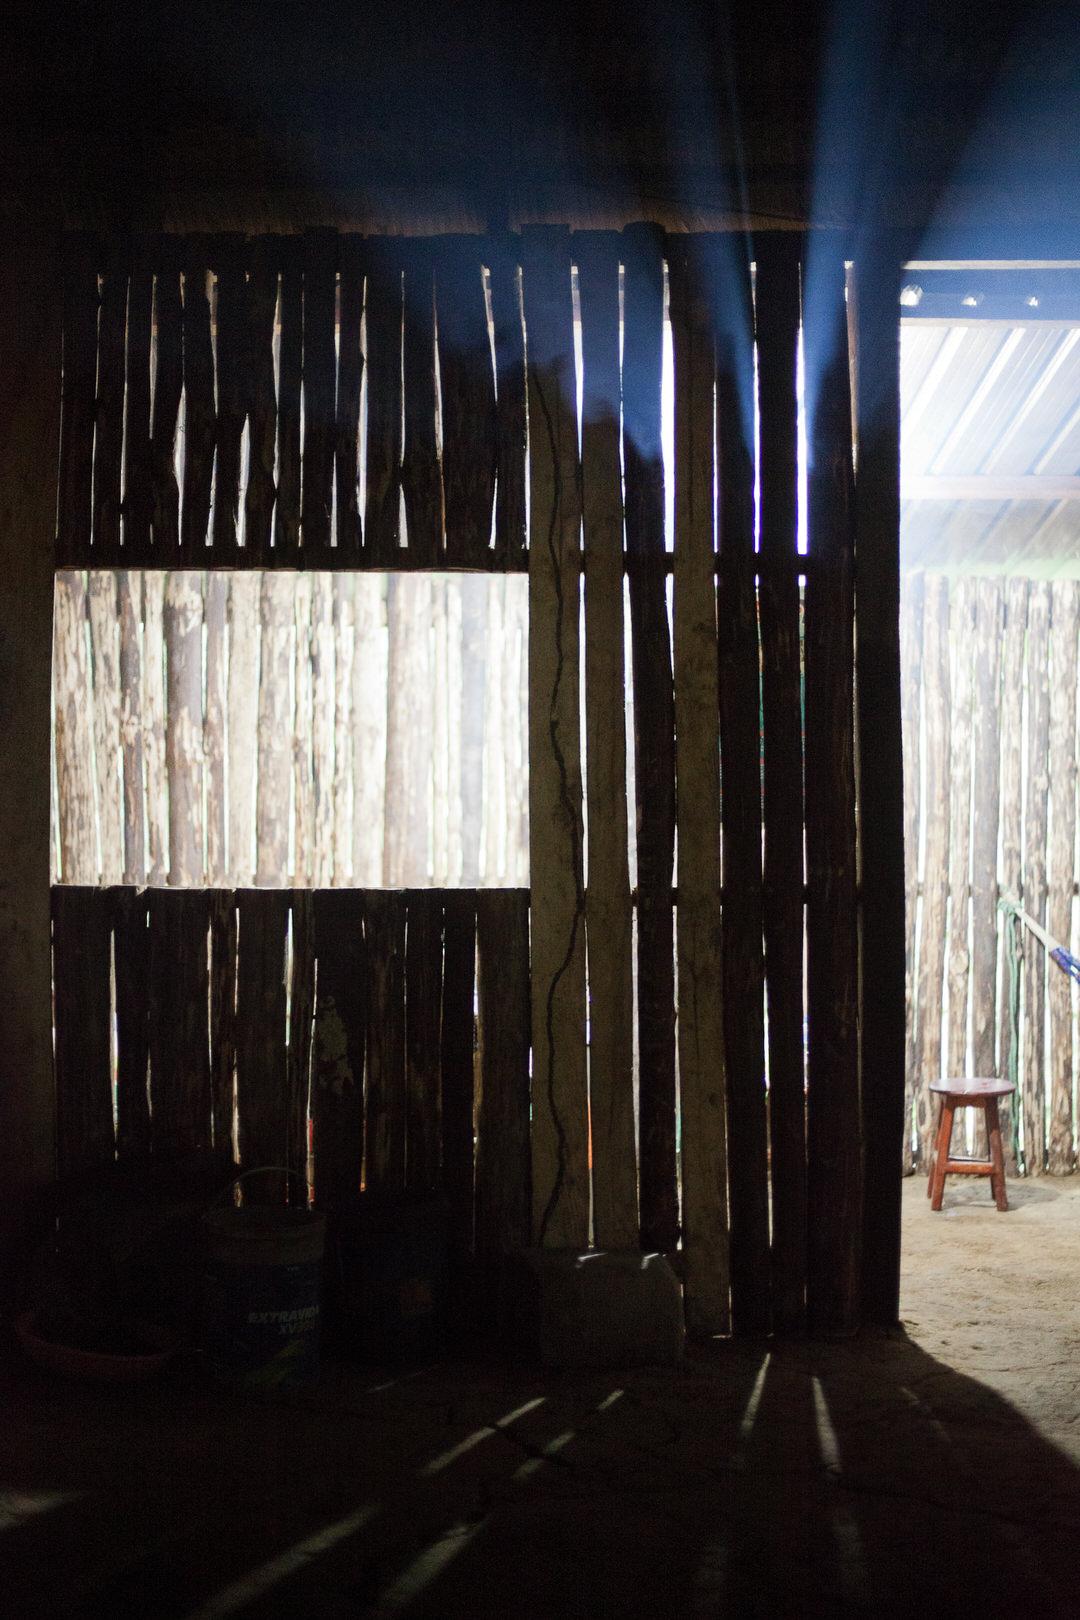 melissa kruse photography - chinimp tuna station, amazon, ecuador-1.jpg